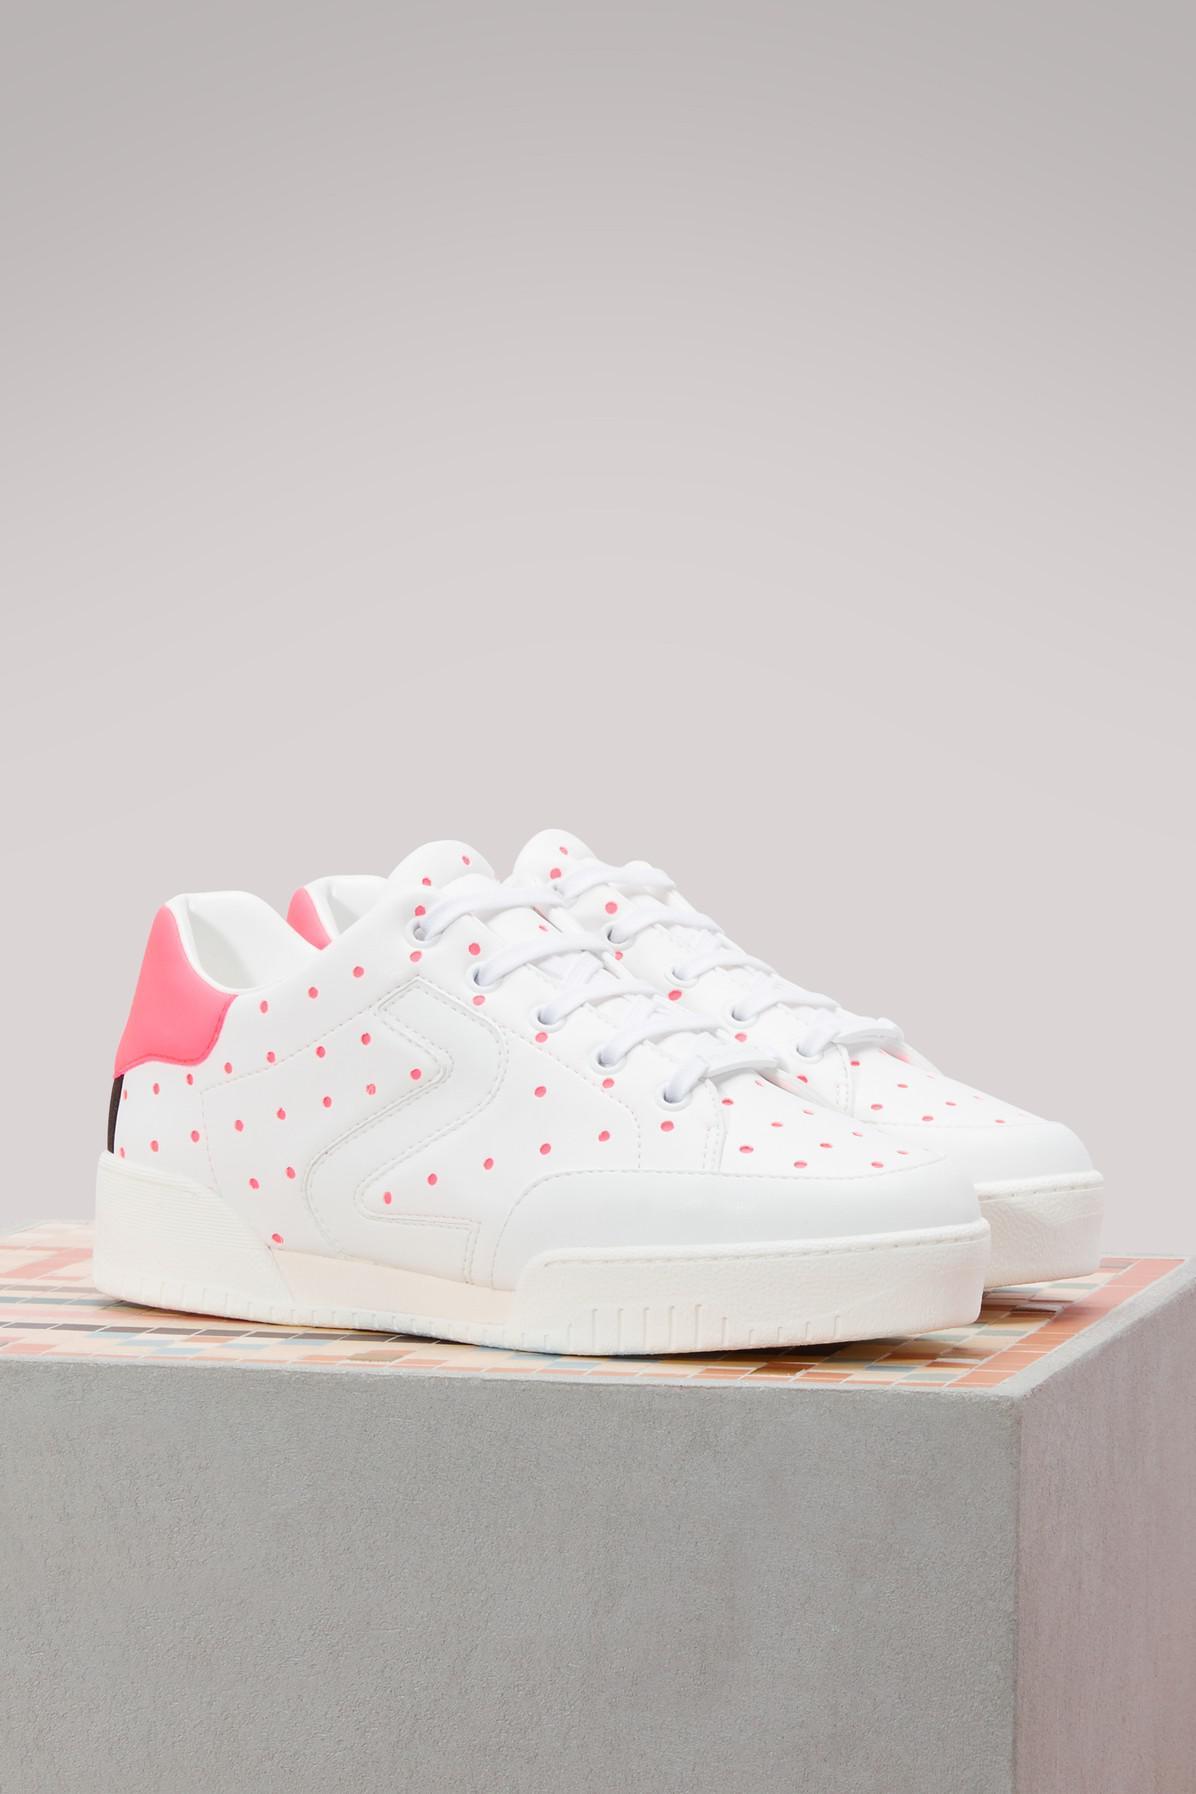 save off 44954 67af7 stella-mccartney-9017-WhtPink-FlBk-Wh-Bk-Stella-Polka-Dot-Sneakers.jpeg